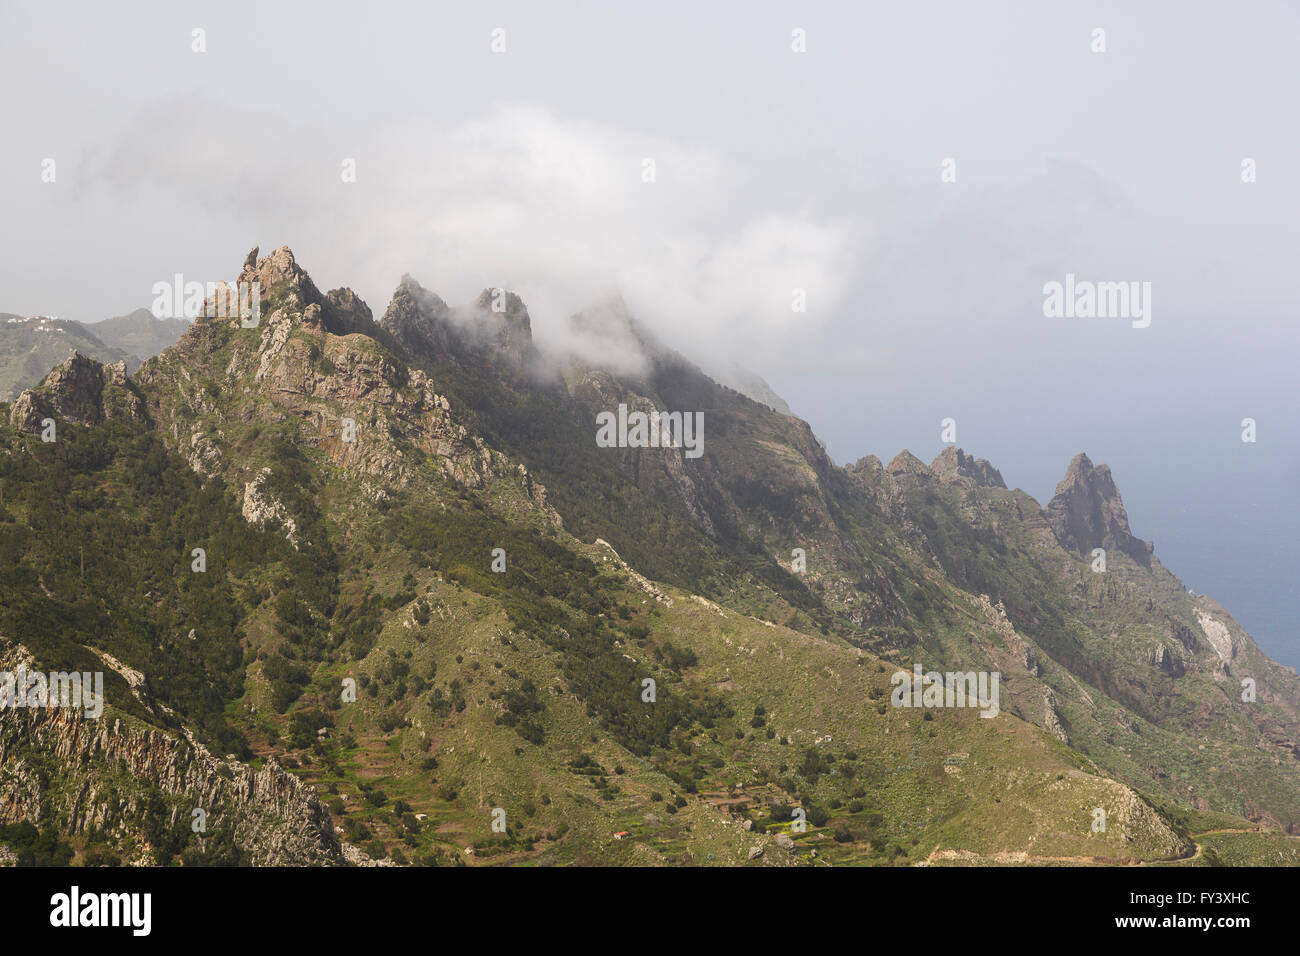 Berge, Agana Halbinsel, Teneriffa, Kanarische Inseln, Spanien Stockfoto